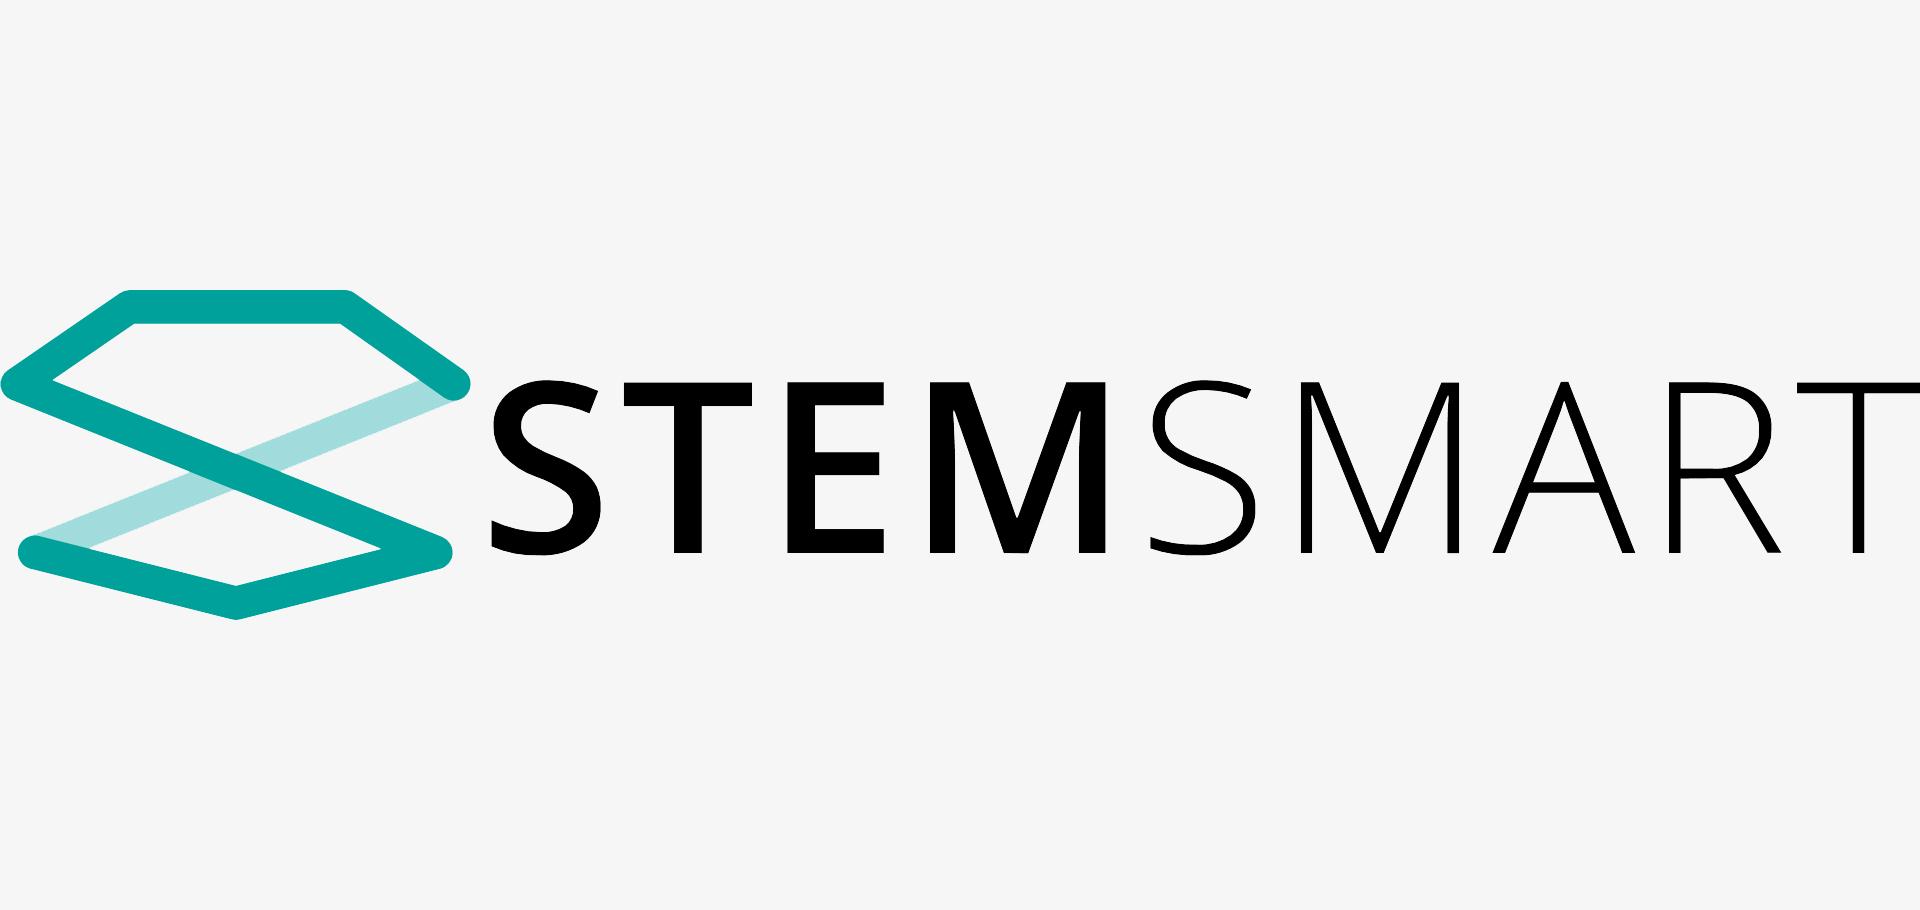 STEM SMART logo